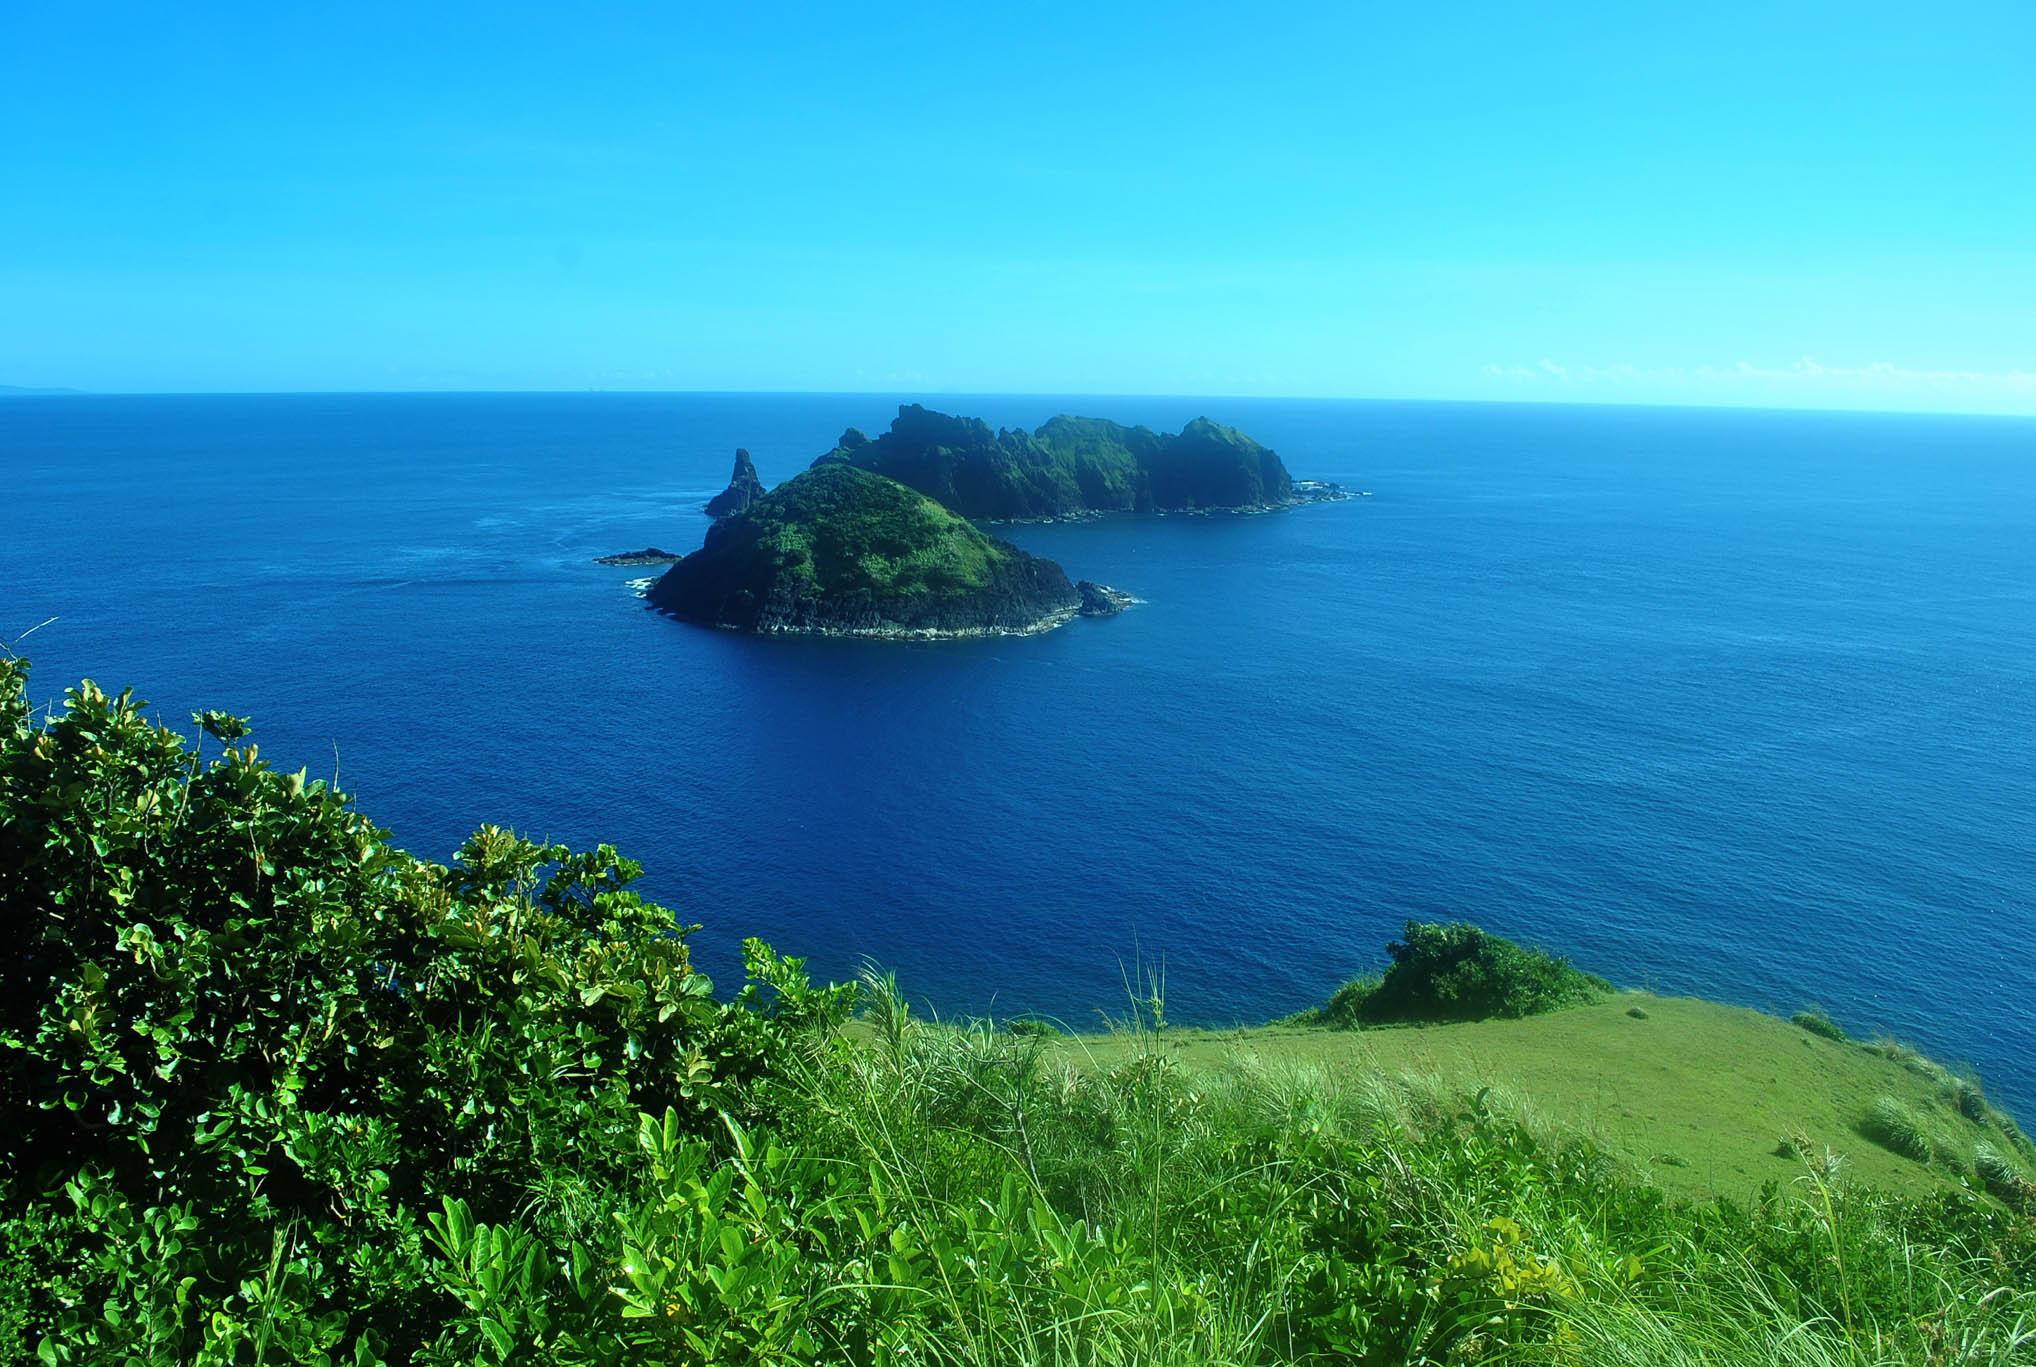 palaui island 9 (1 of 1)